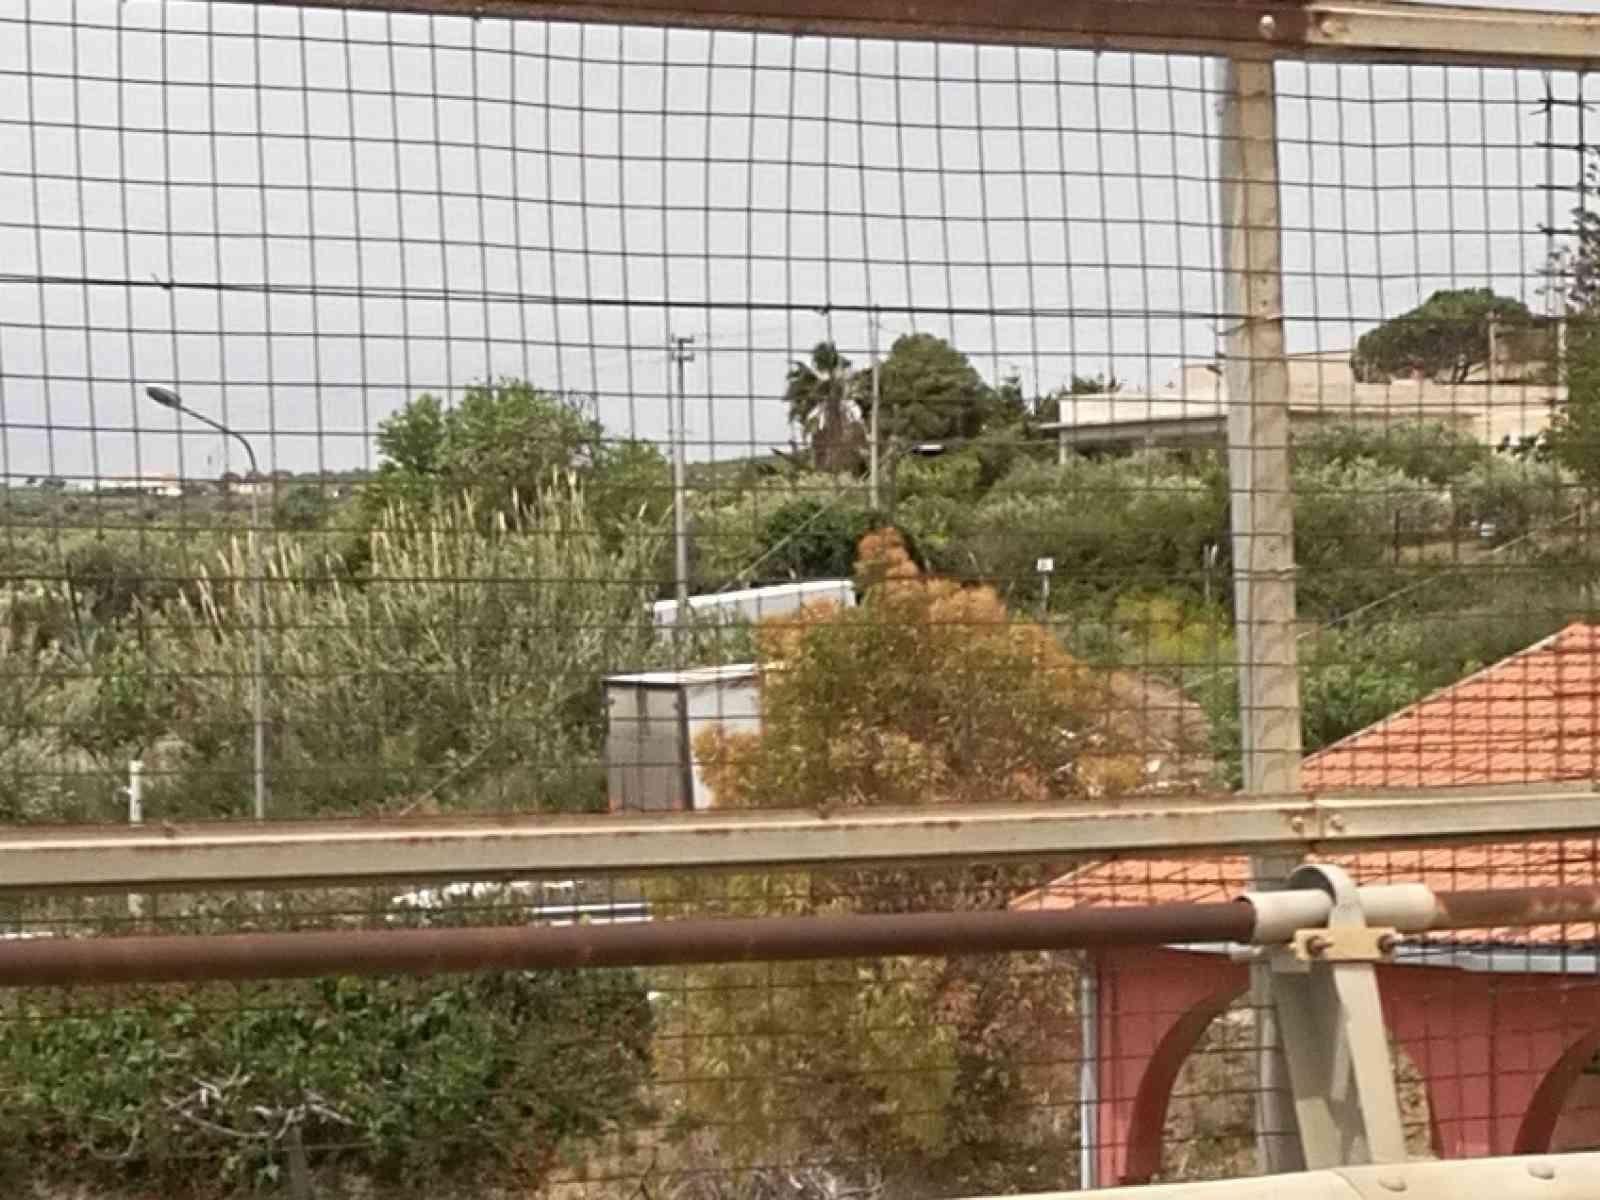 Menfi. Incidente sulla strada tra Menfi e Santa Margherita. Camion va fuori strada. 2 feriti